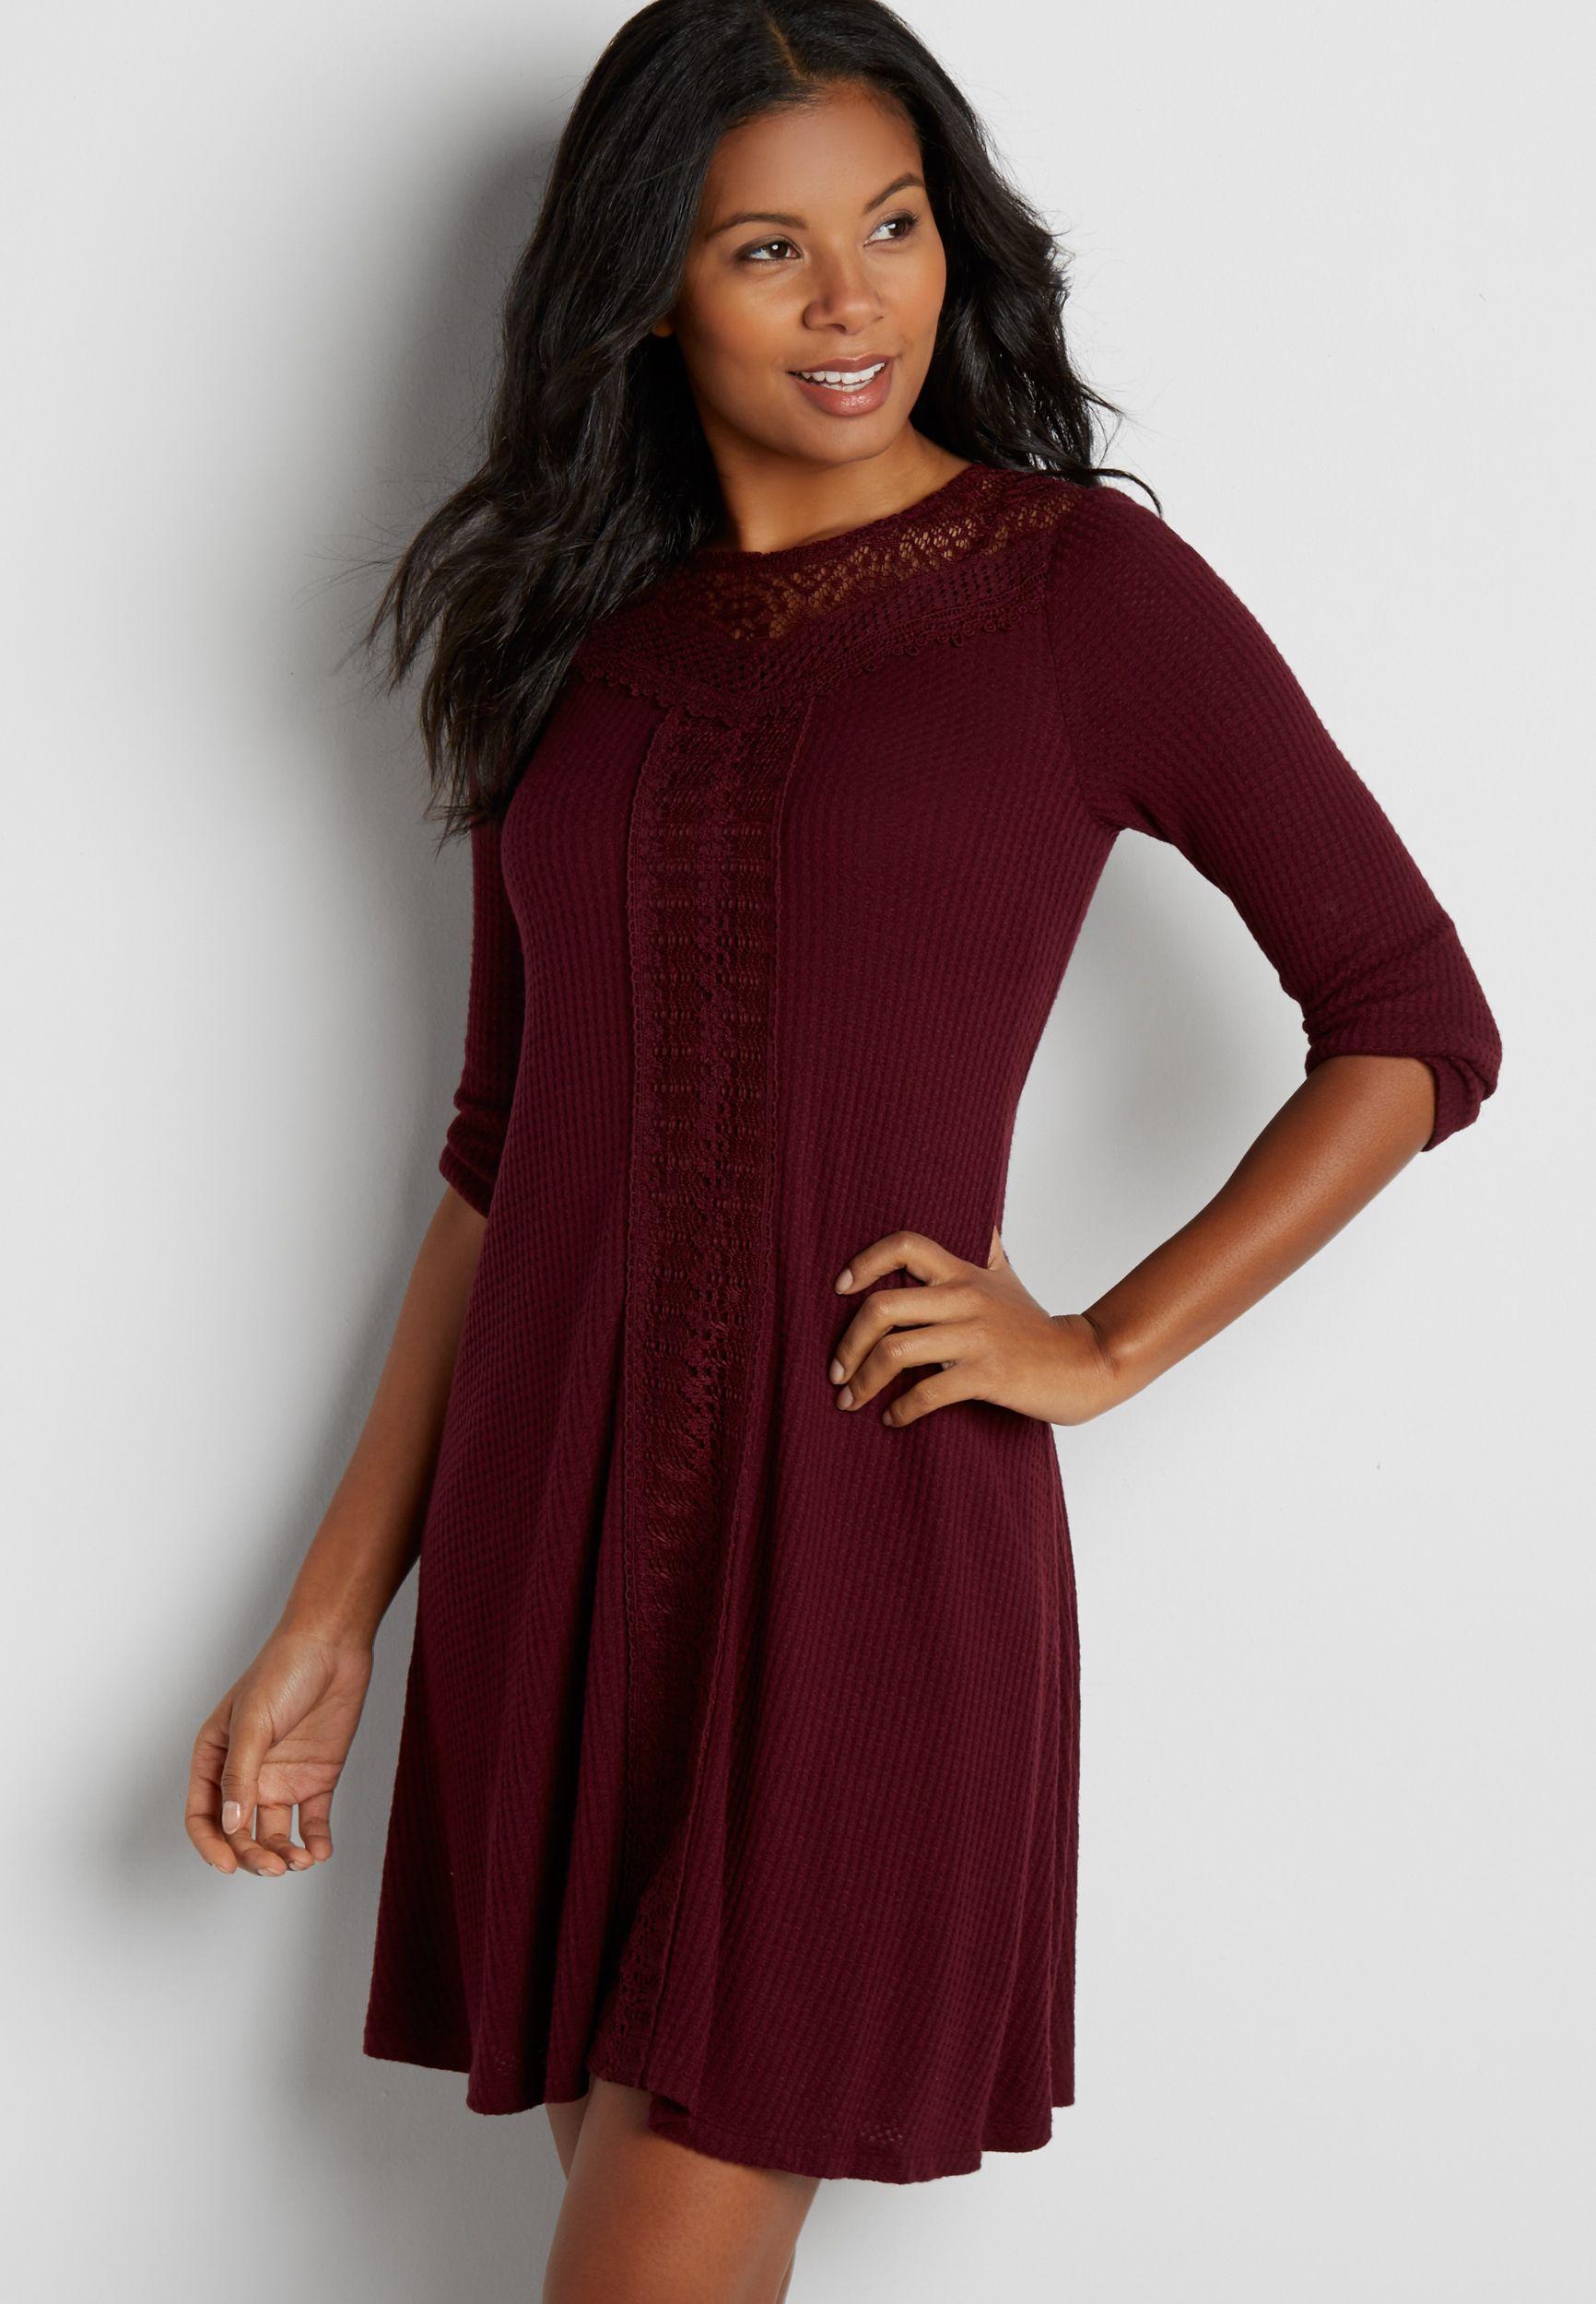 Waffle Knit Dress With Lace Original Price 44 00 Available At Maurices Knit Dress Lace Dress Dresses [ 2500 x 1732 Pixel ]